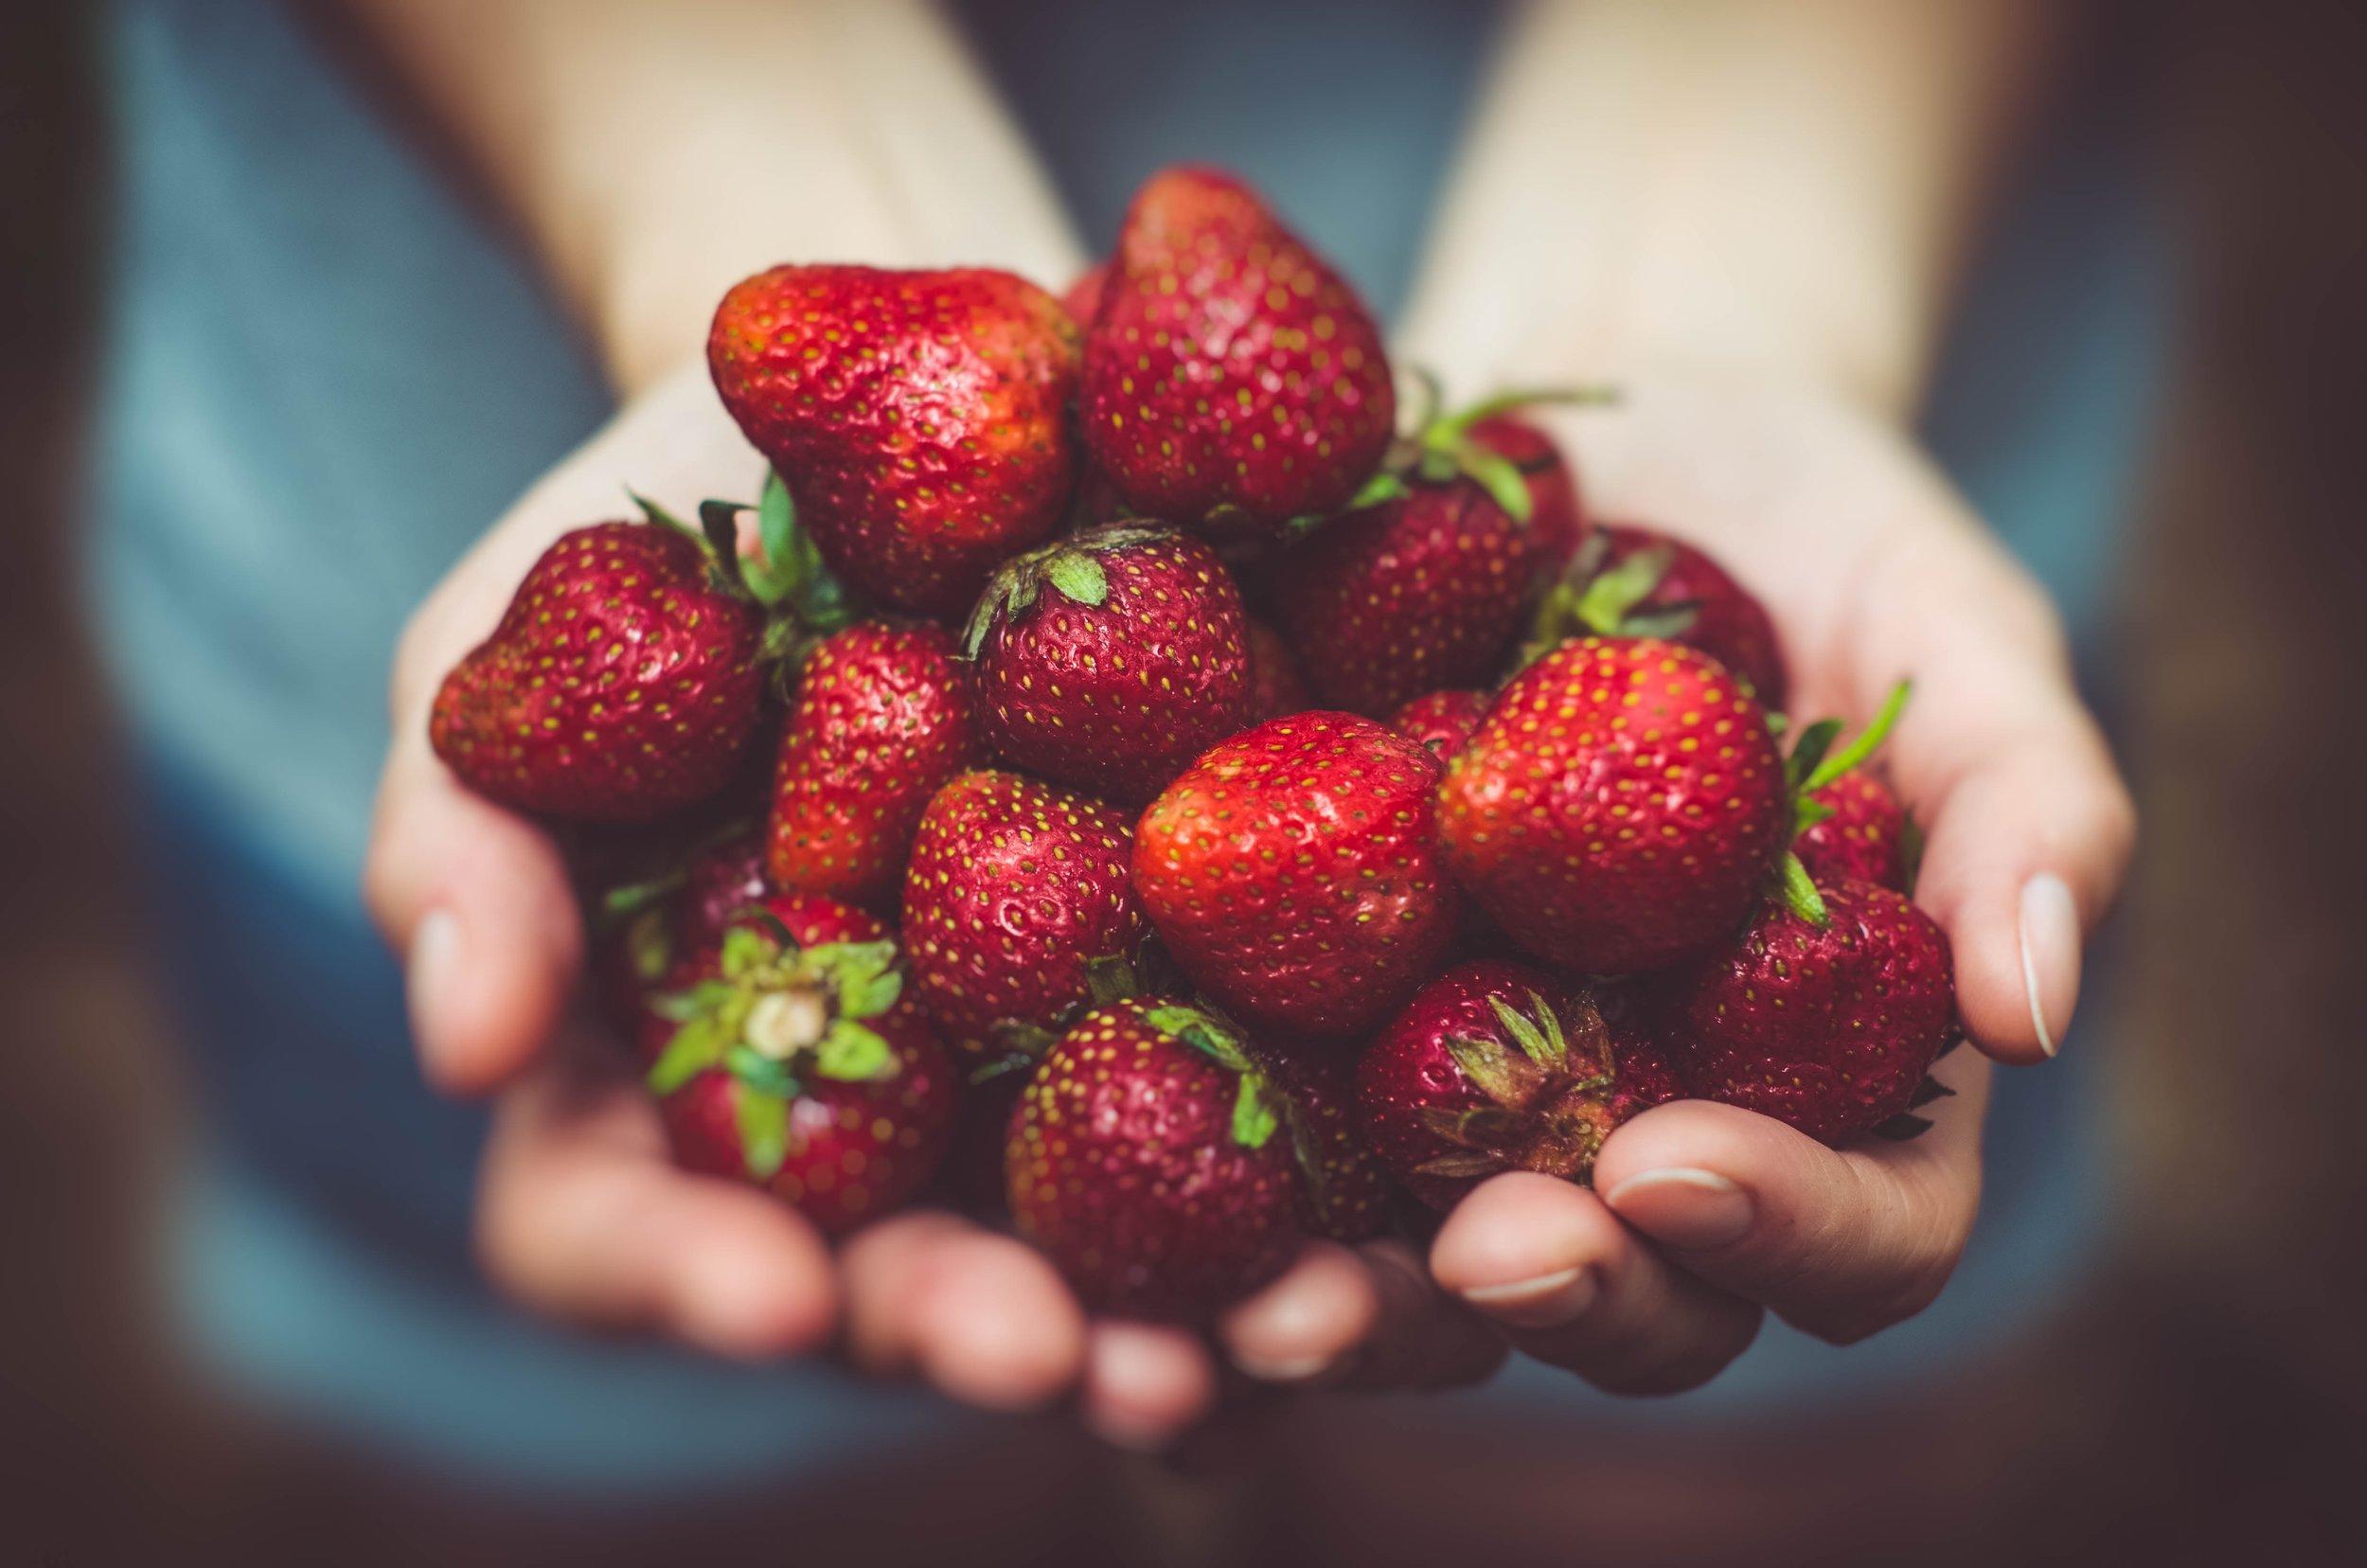 strawberries - What's in Season?